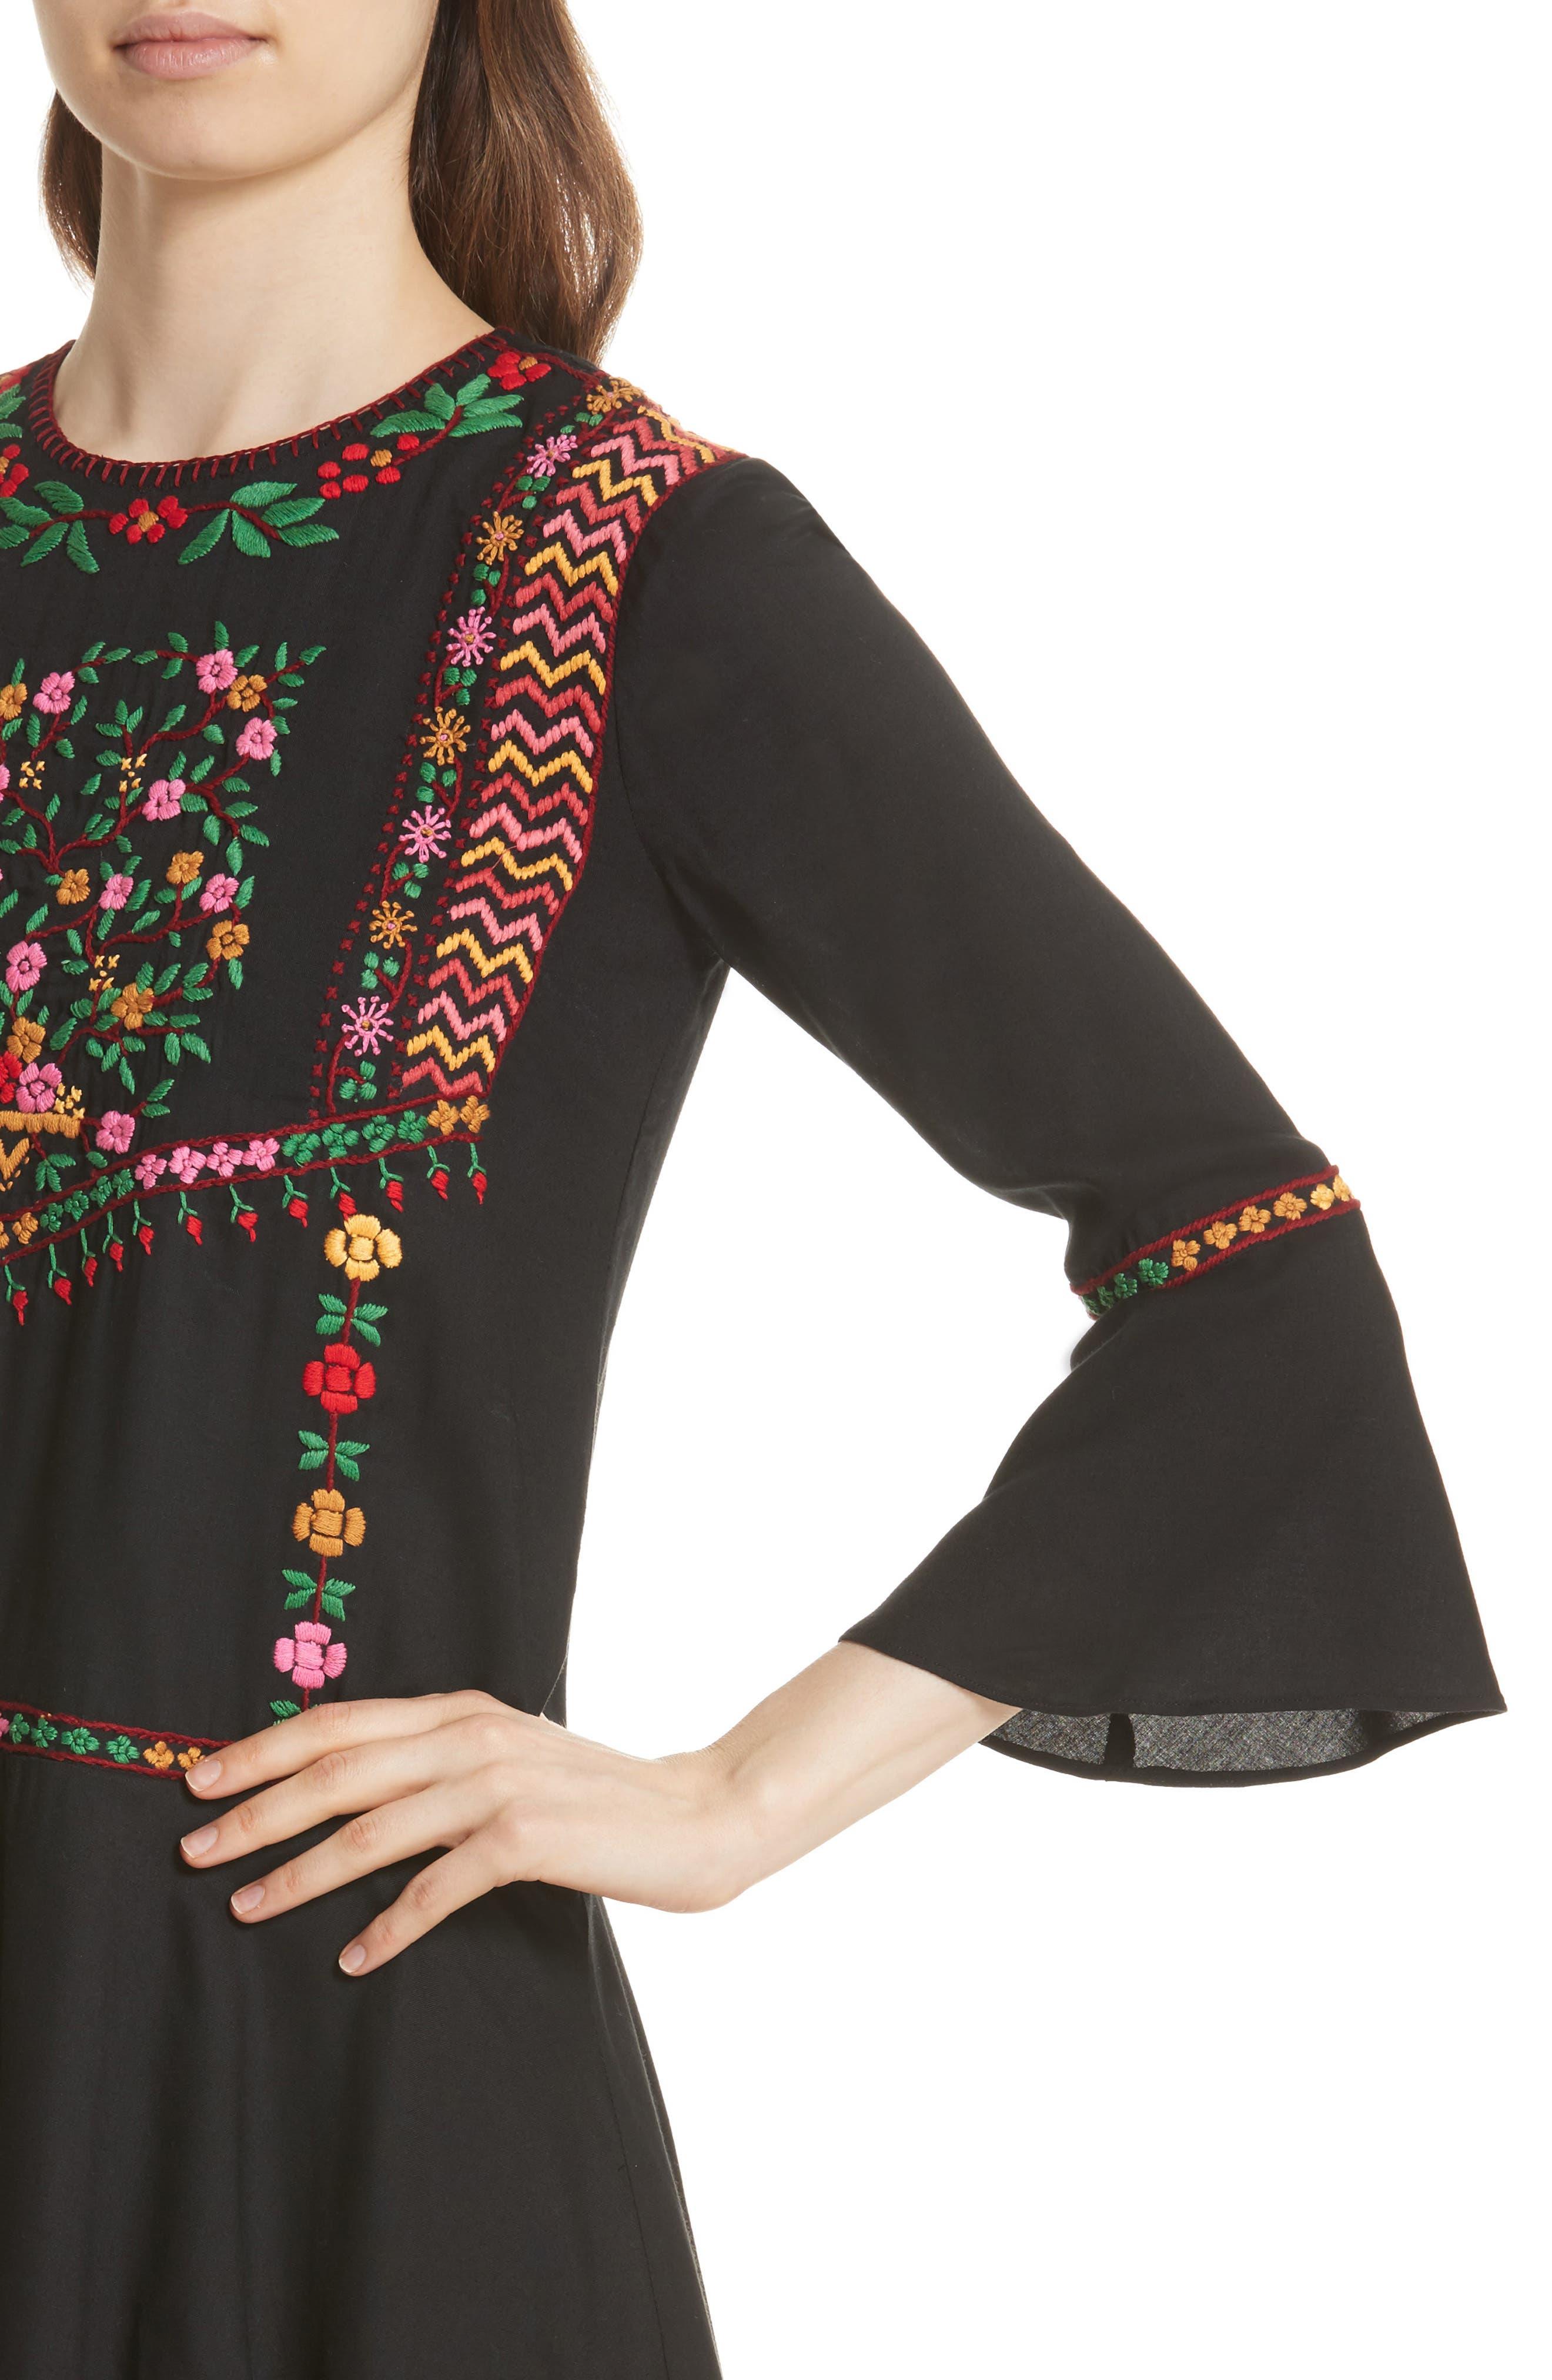 Gosinda Embroidered Dress,                             Alternate thumbnail 4, color,                             009